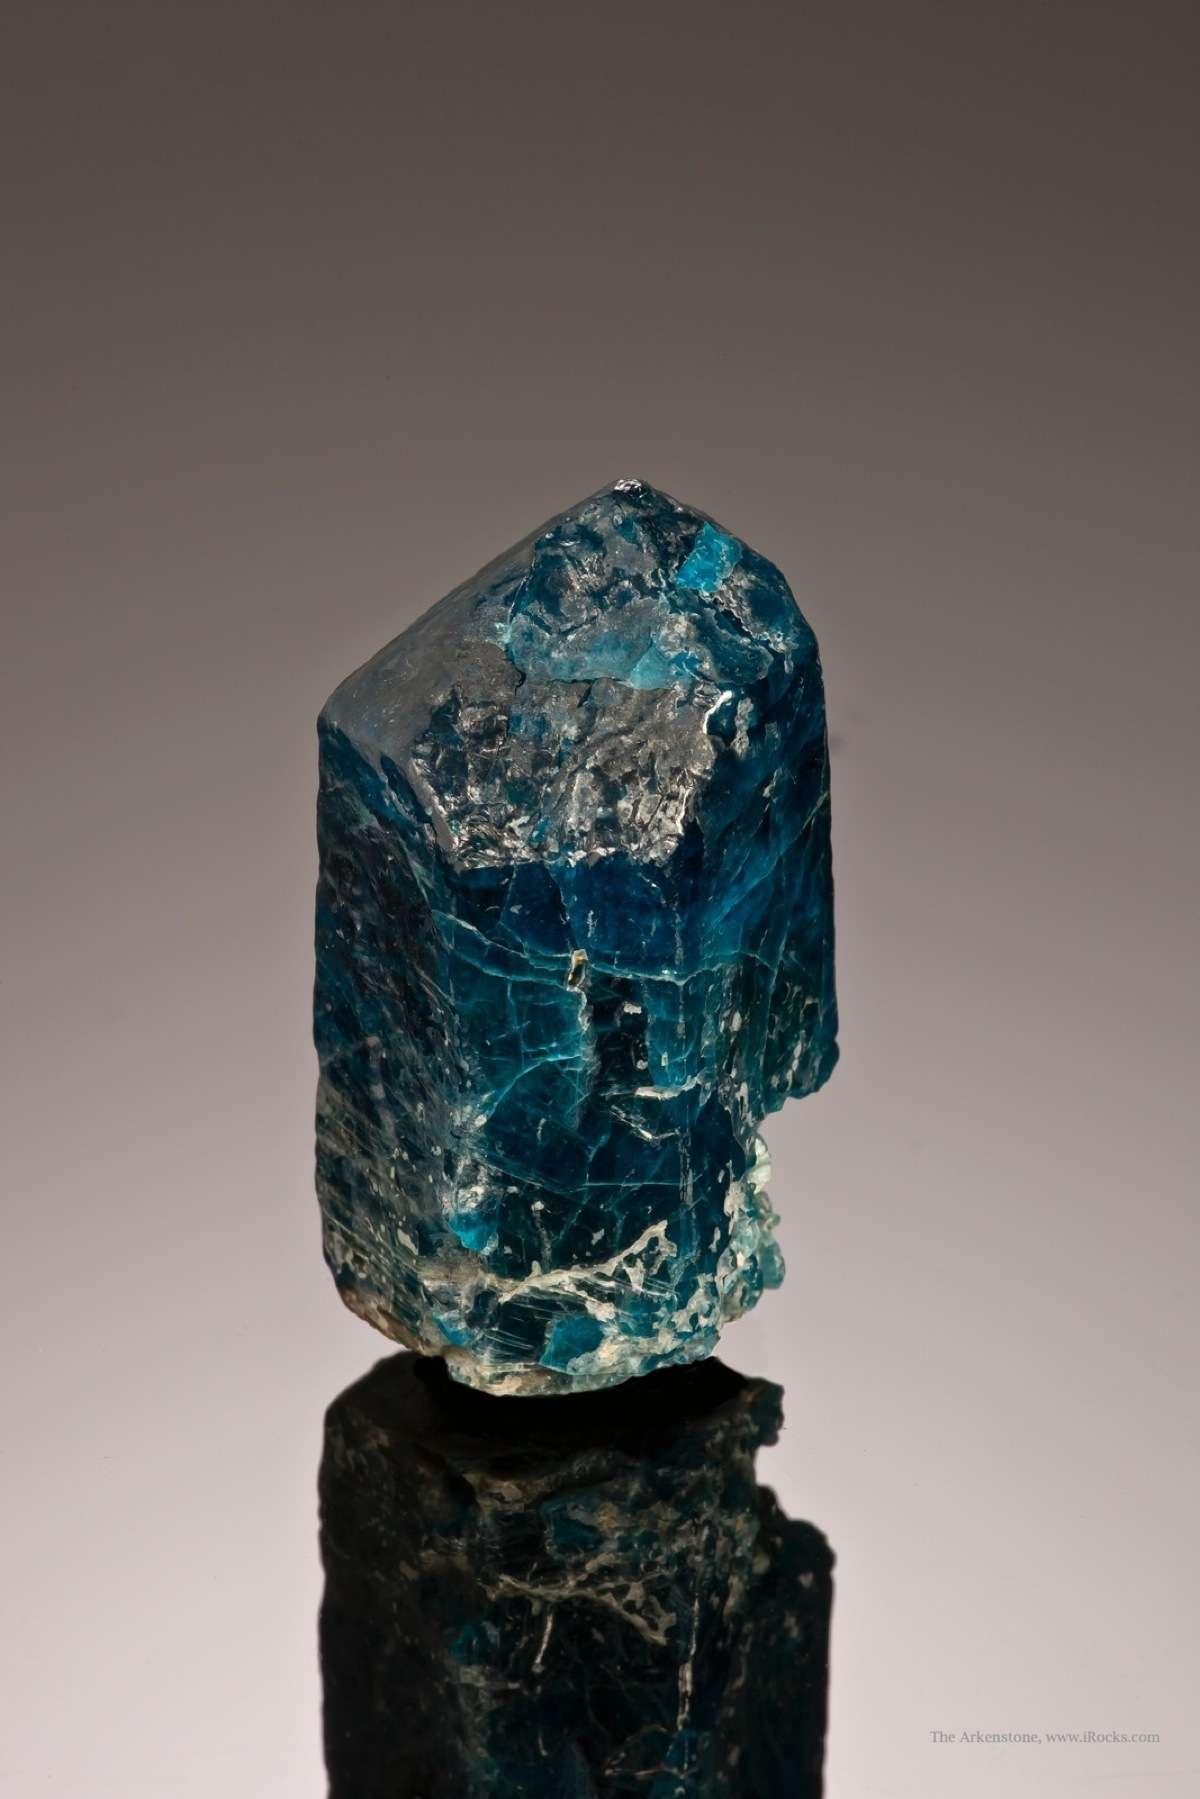 Rare Blue Brazilian Apatite var. Fluorapatite | iRocks Fine Minerals